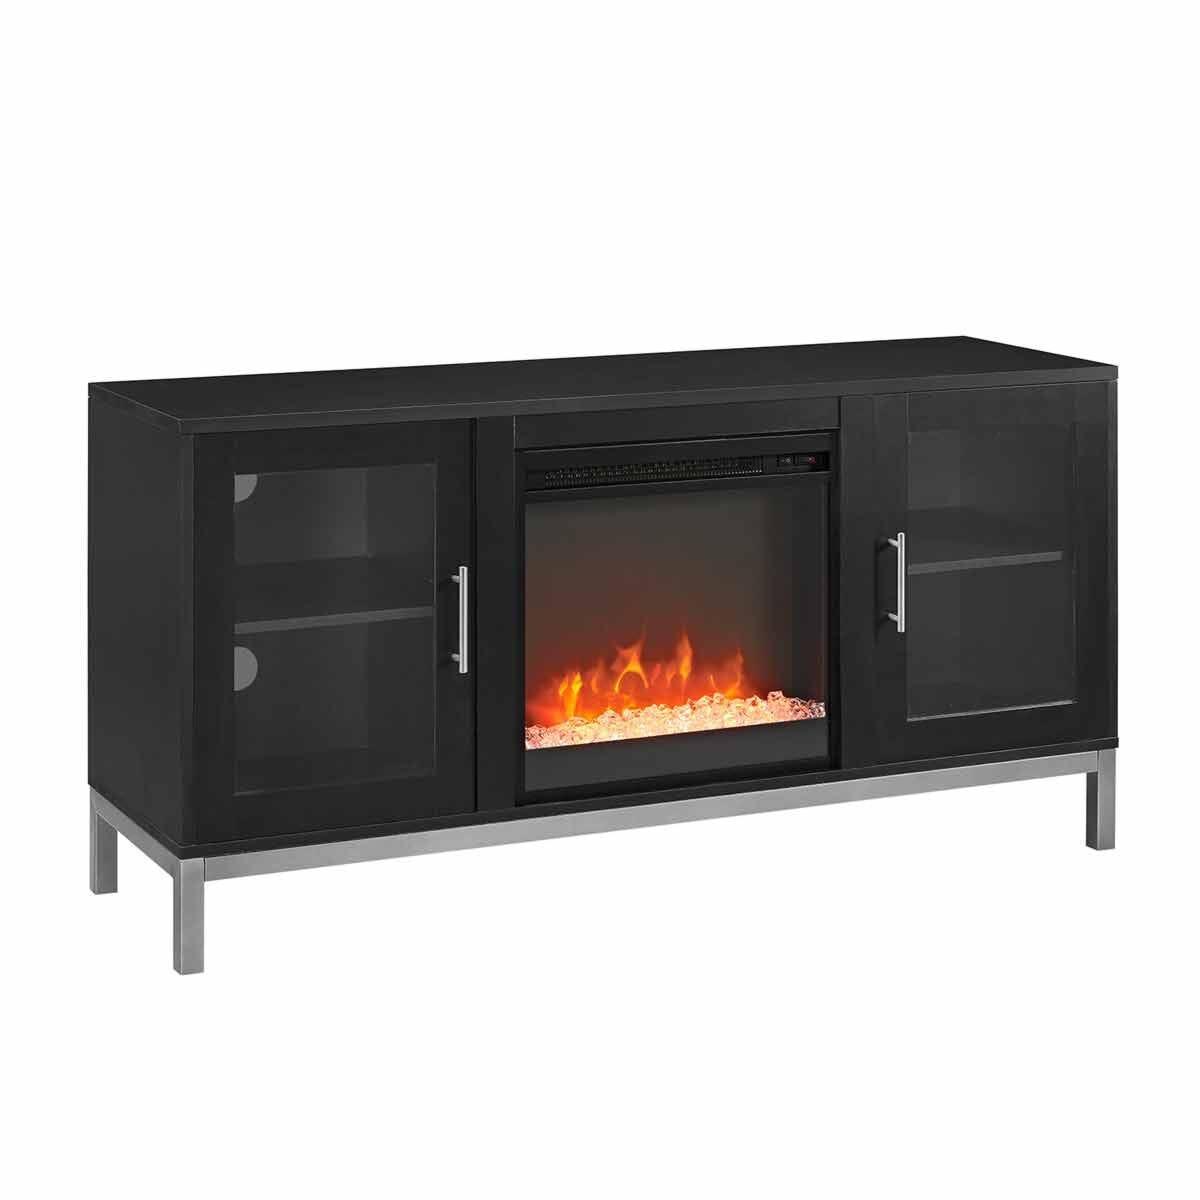 Melfi Modern Fireplace TV Stand